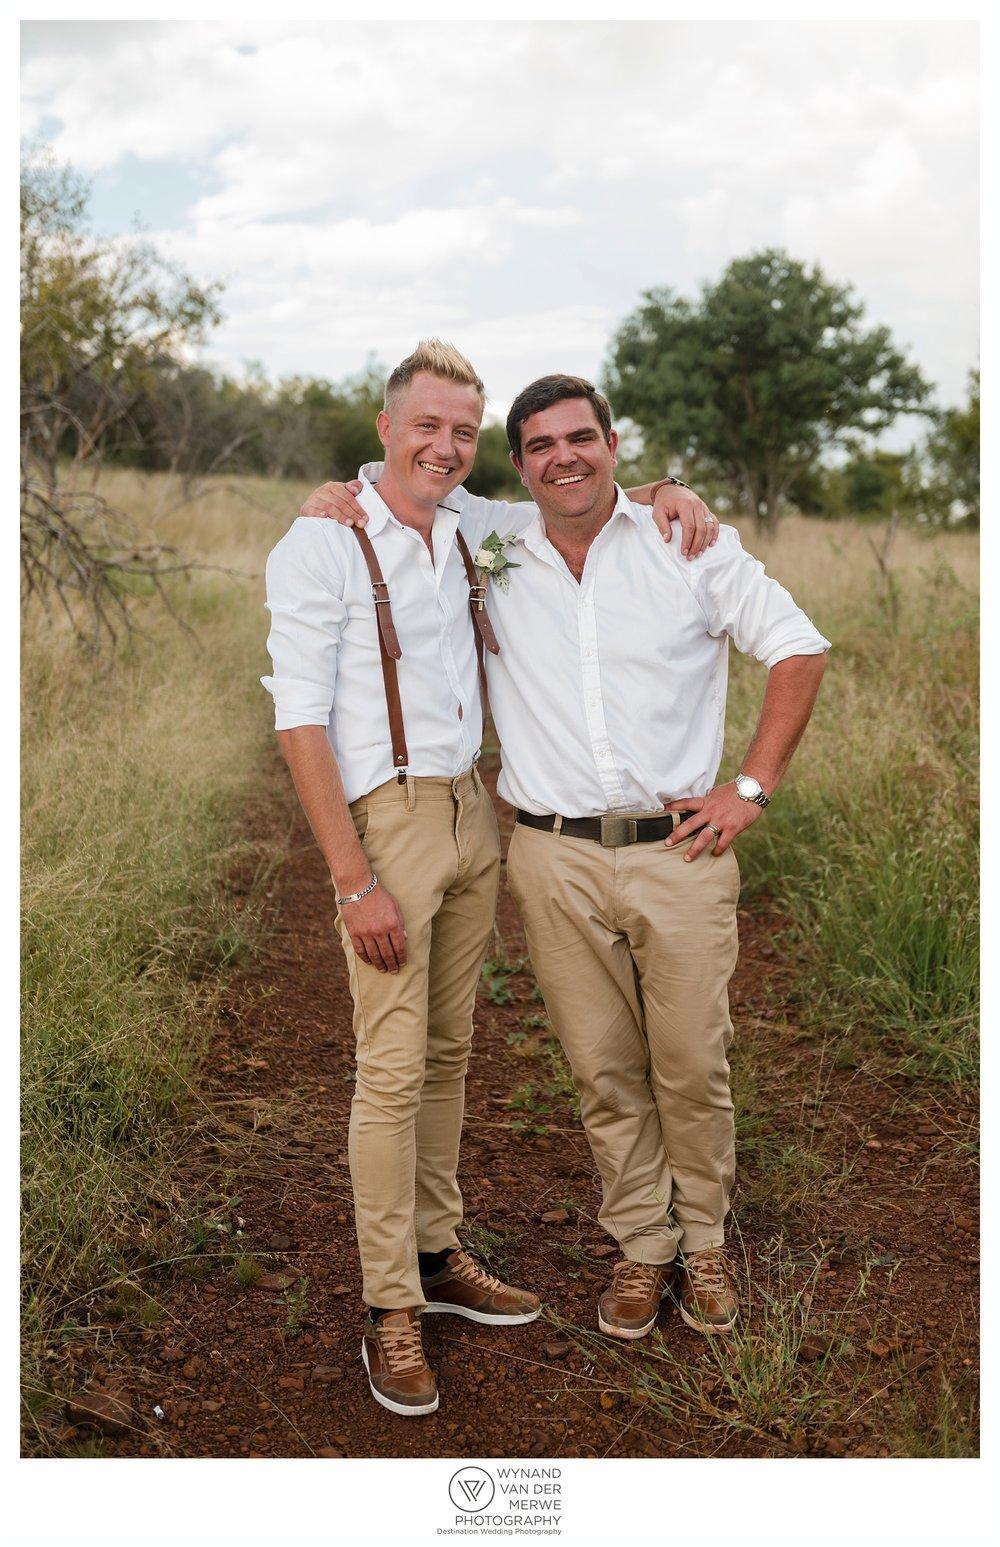 WynandvanderMerwe_weddingphotography_bushveldwedding_northam_bushveld_limpopowedding_limpopo_southafrica-208.jpg